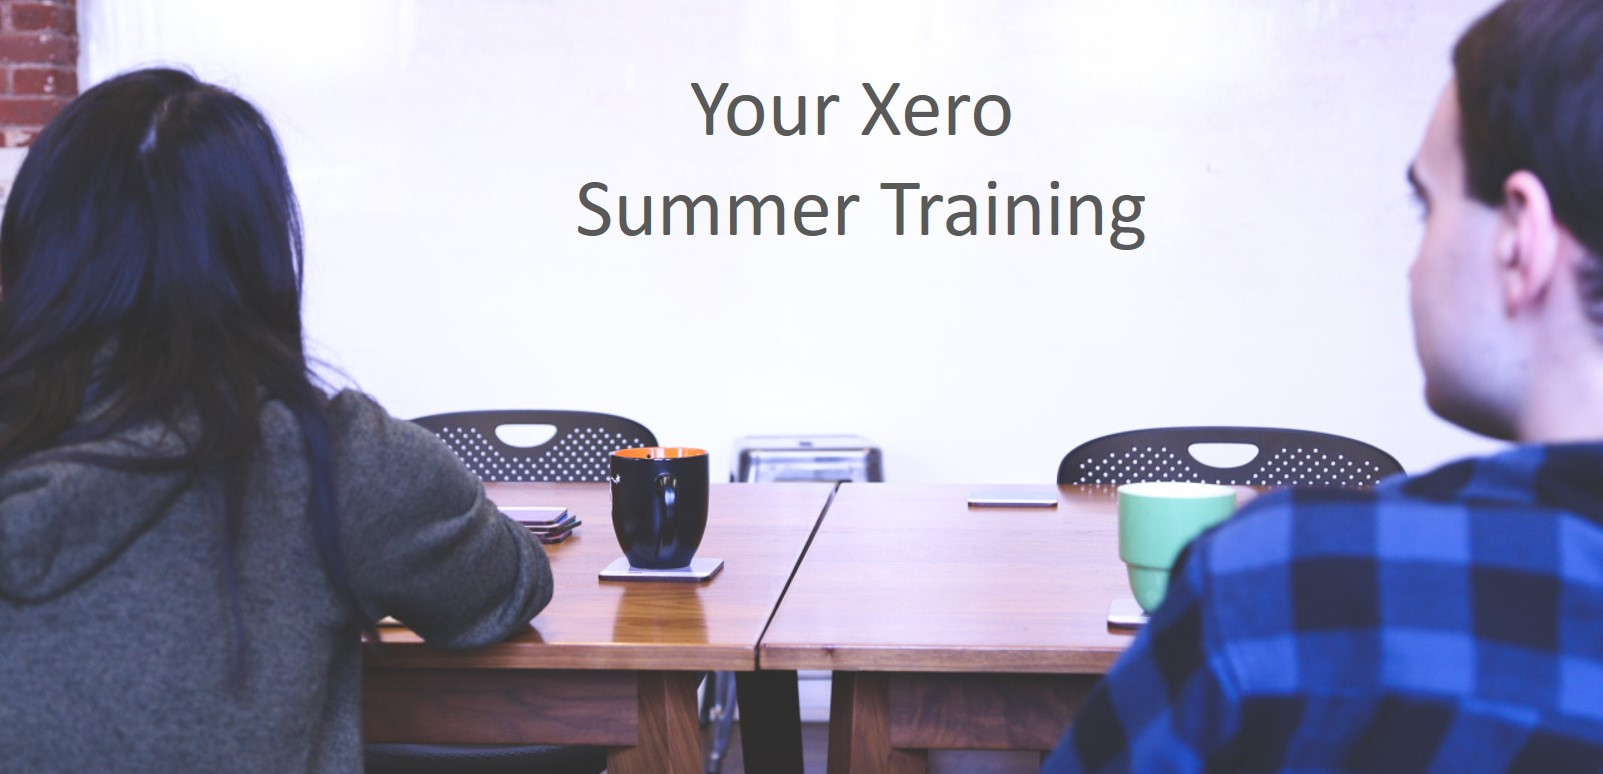 Xero Summer Training